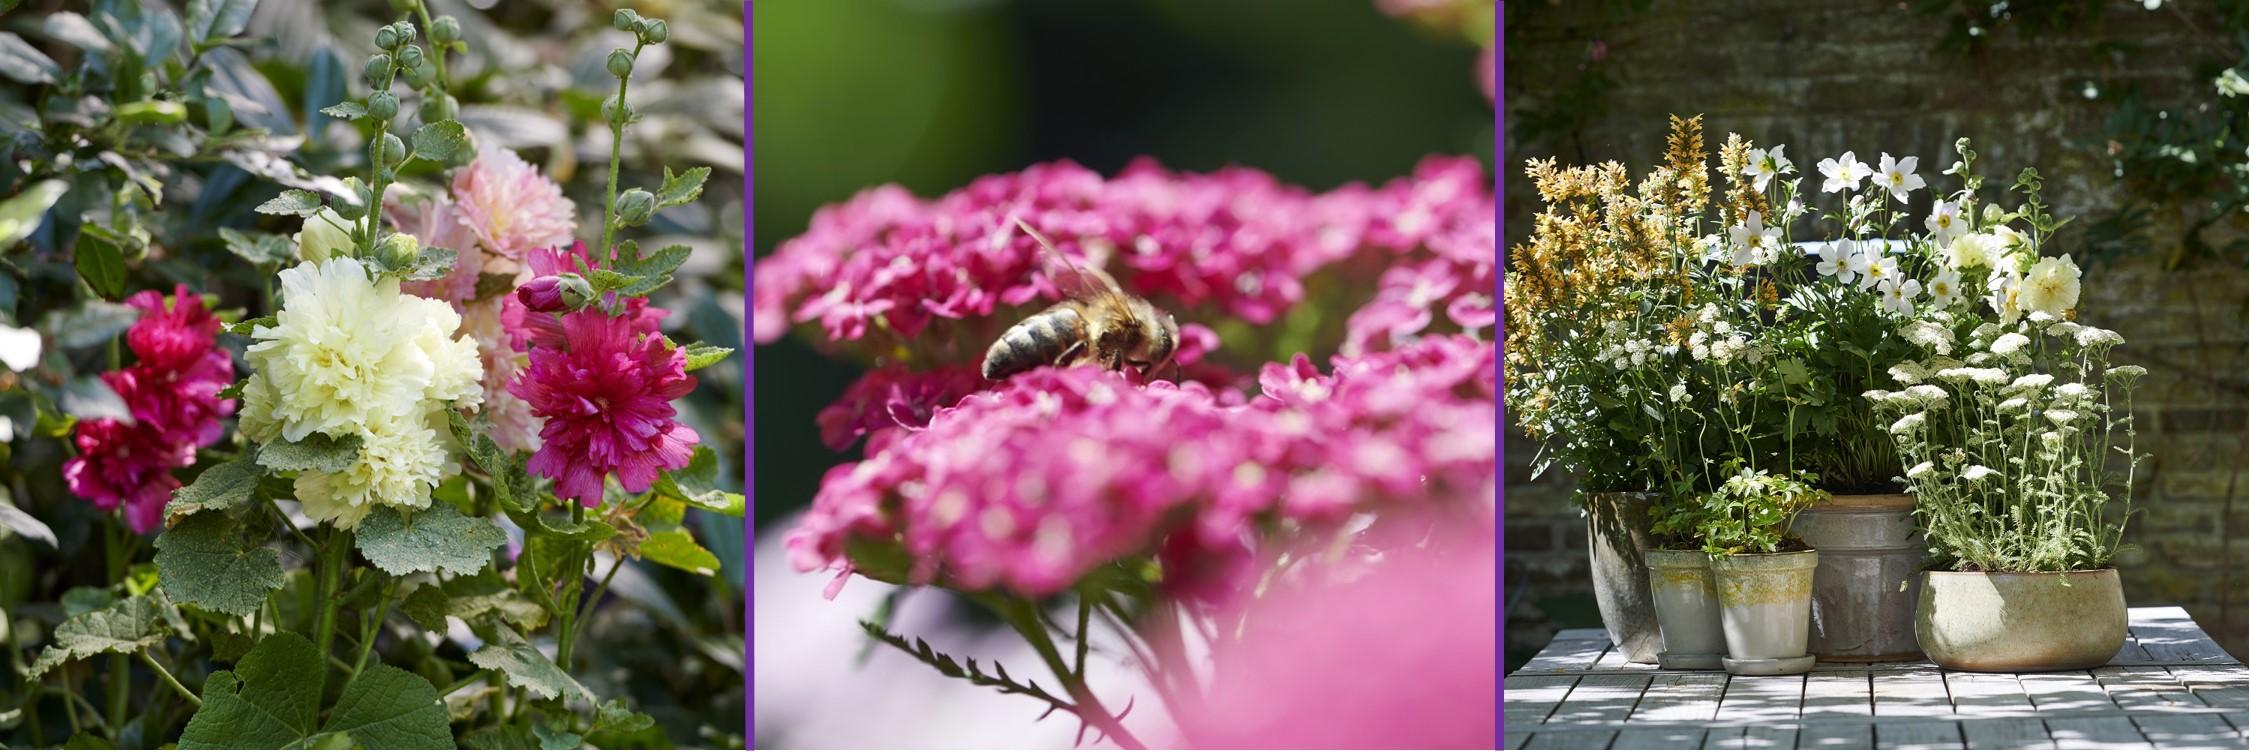 Bienenfreunde: Gartenpflanzen des Monats Juli 2019